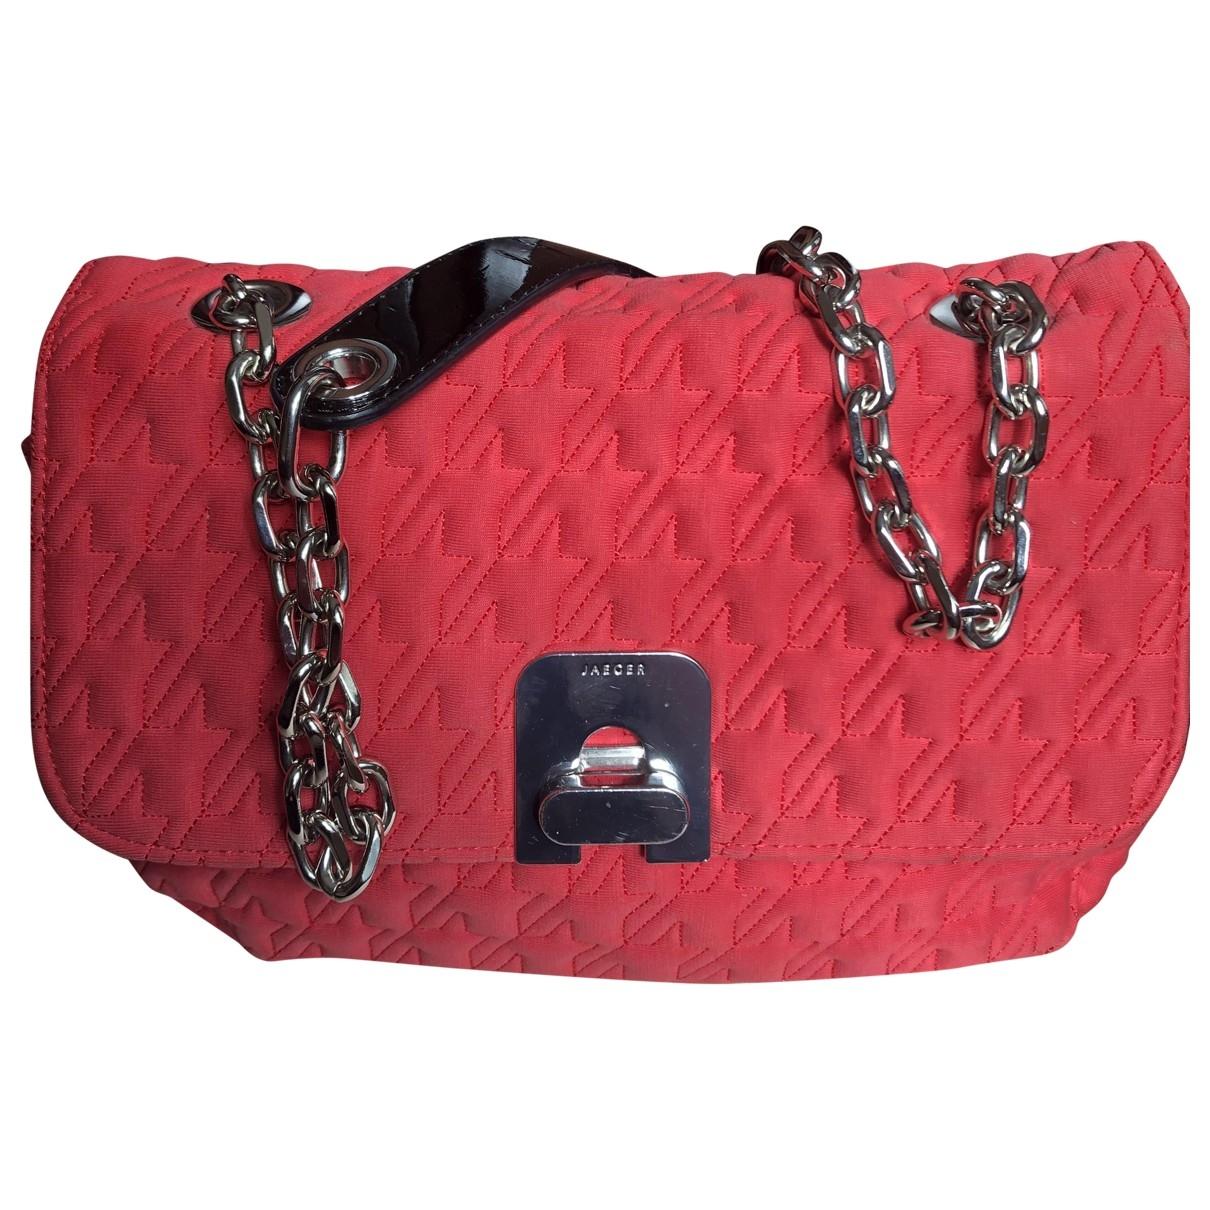 Jaeger \N Handtasche in  Rot Baumwolle